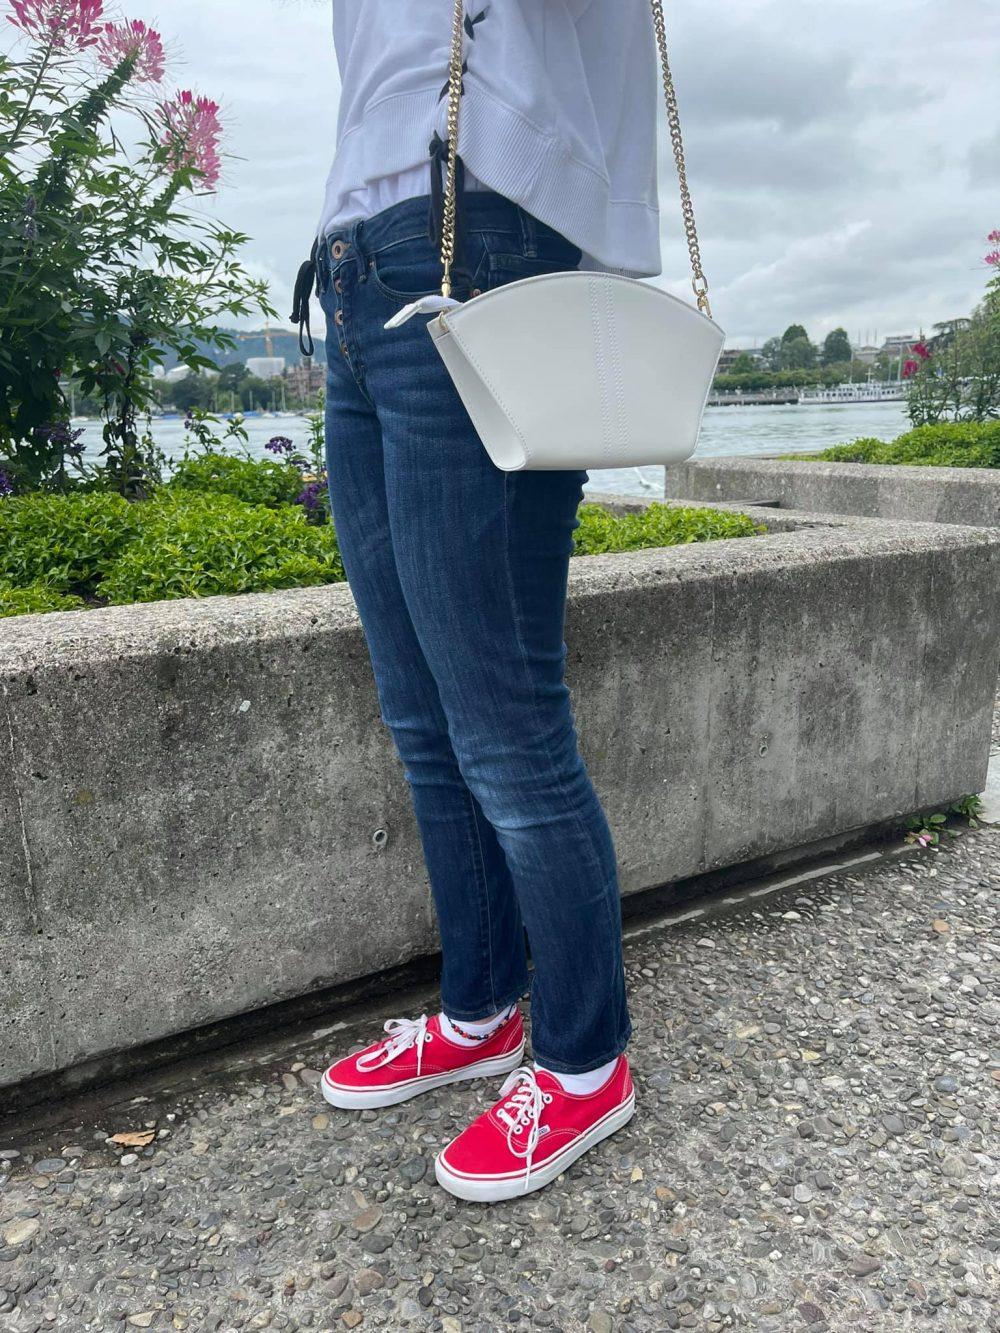 Sustainable Vegan Handbags by Swiss Startup KOVU Made of Corn Leather